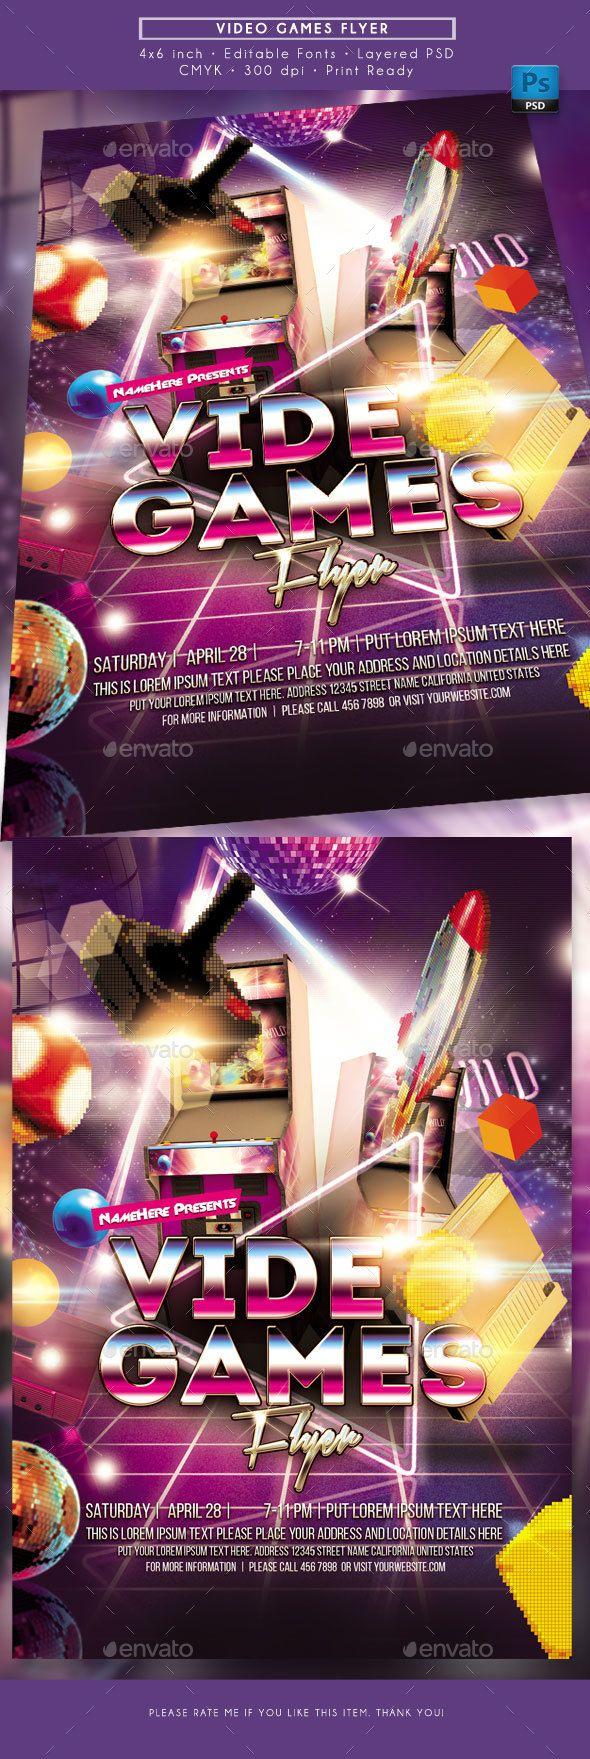 Video Games Flyer Template Psd - Download Here:  Https://graphicriver.net/item/video-Games-Flyer/21745638?ref=Ksioks